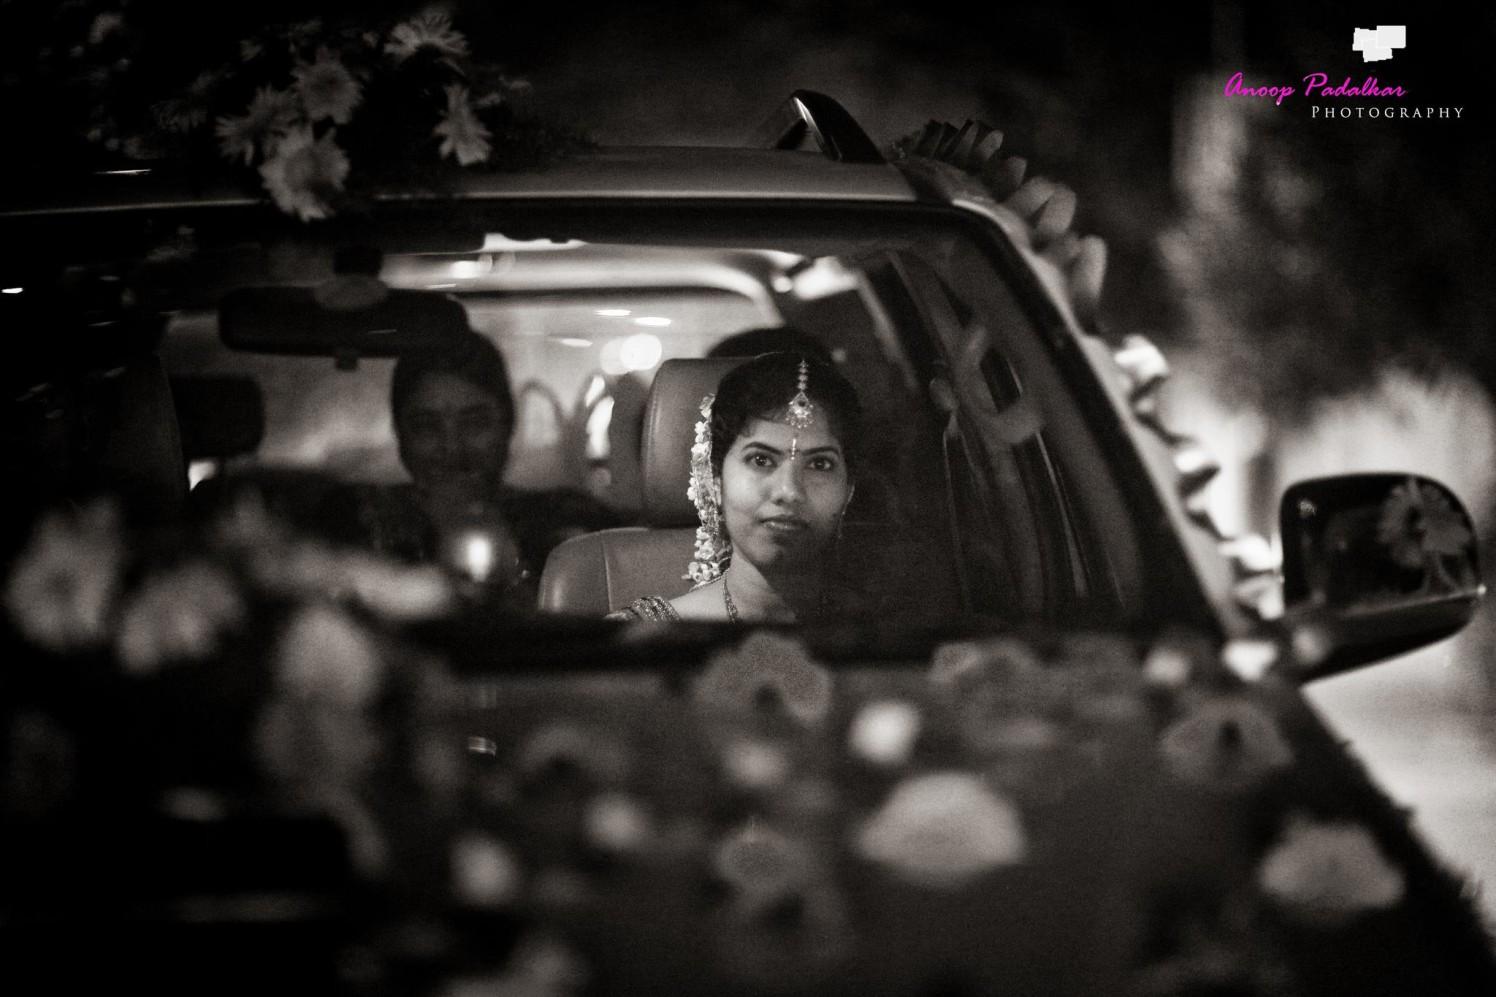 Rare beauty by Wedding Krafter Wedding-photography | Weddings Photos & Ideas